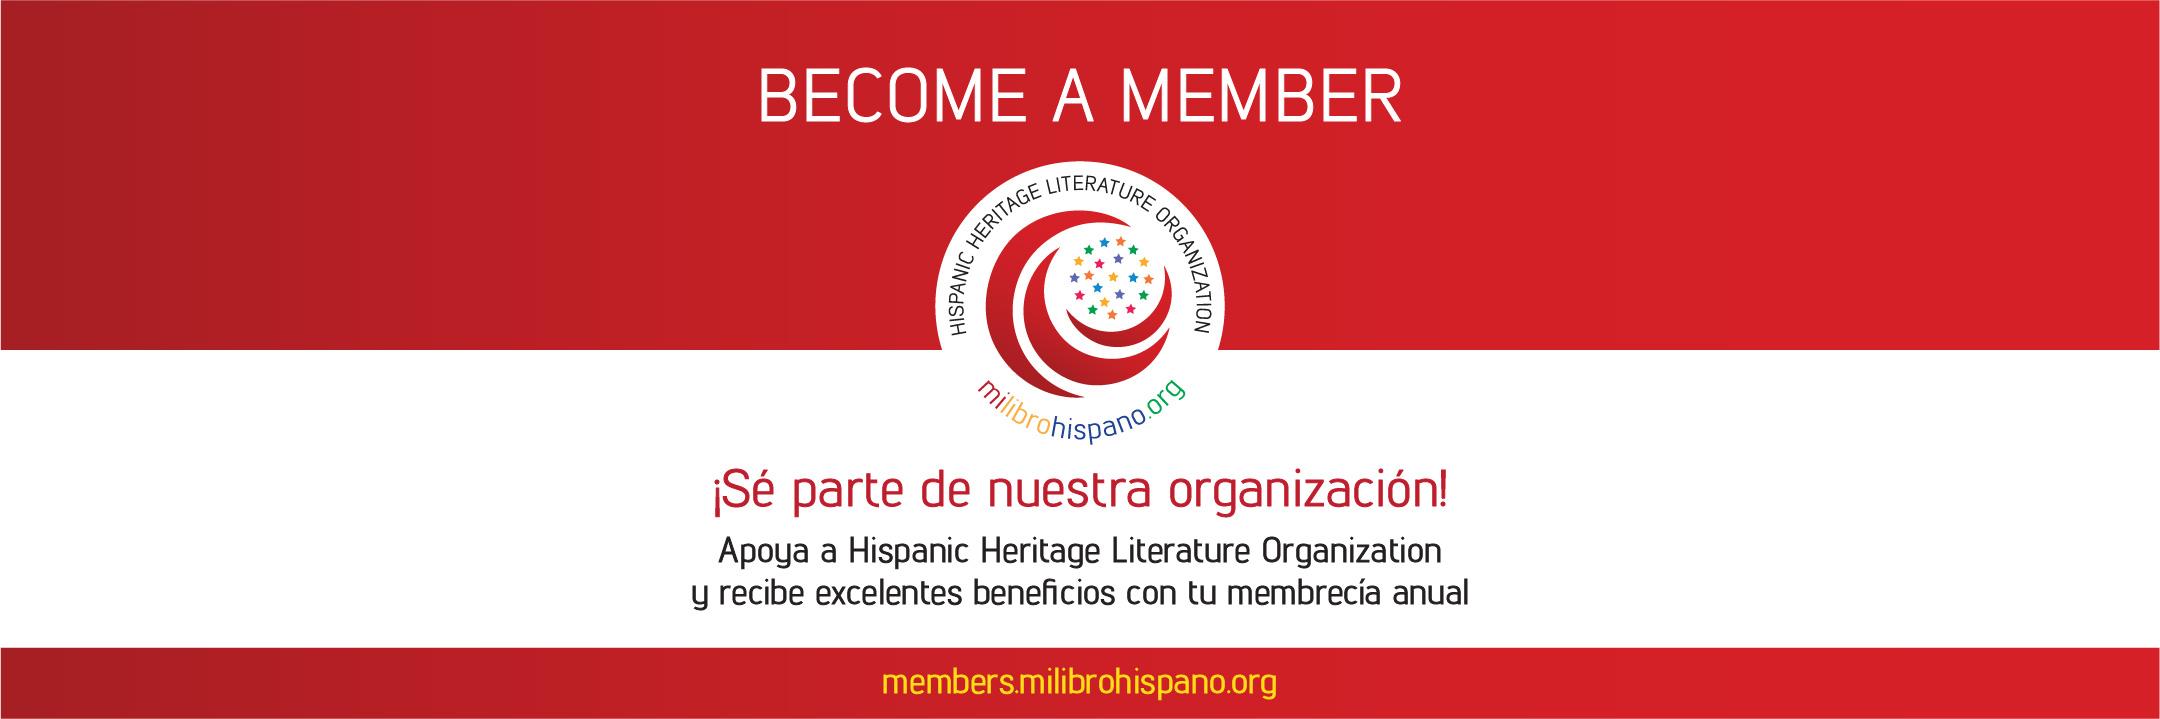 HHLO Become a Member